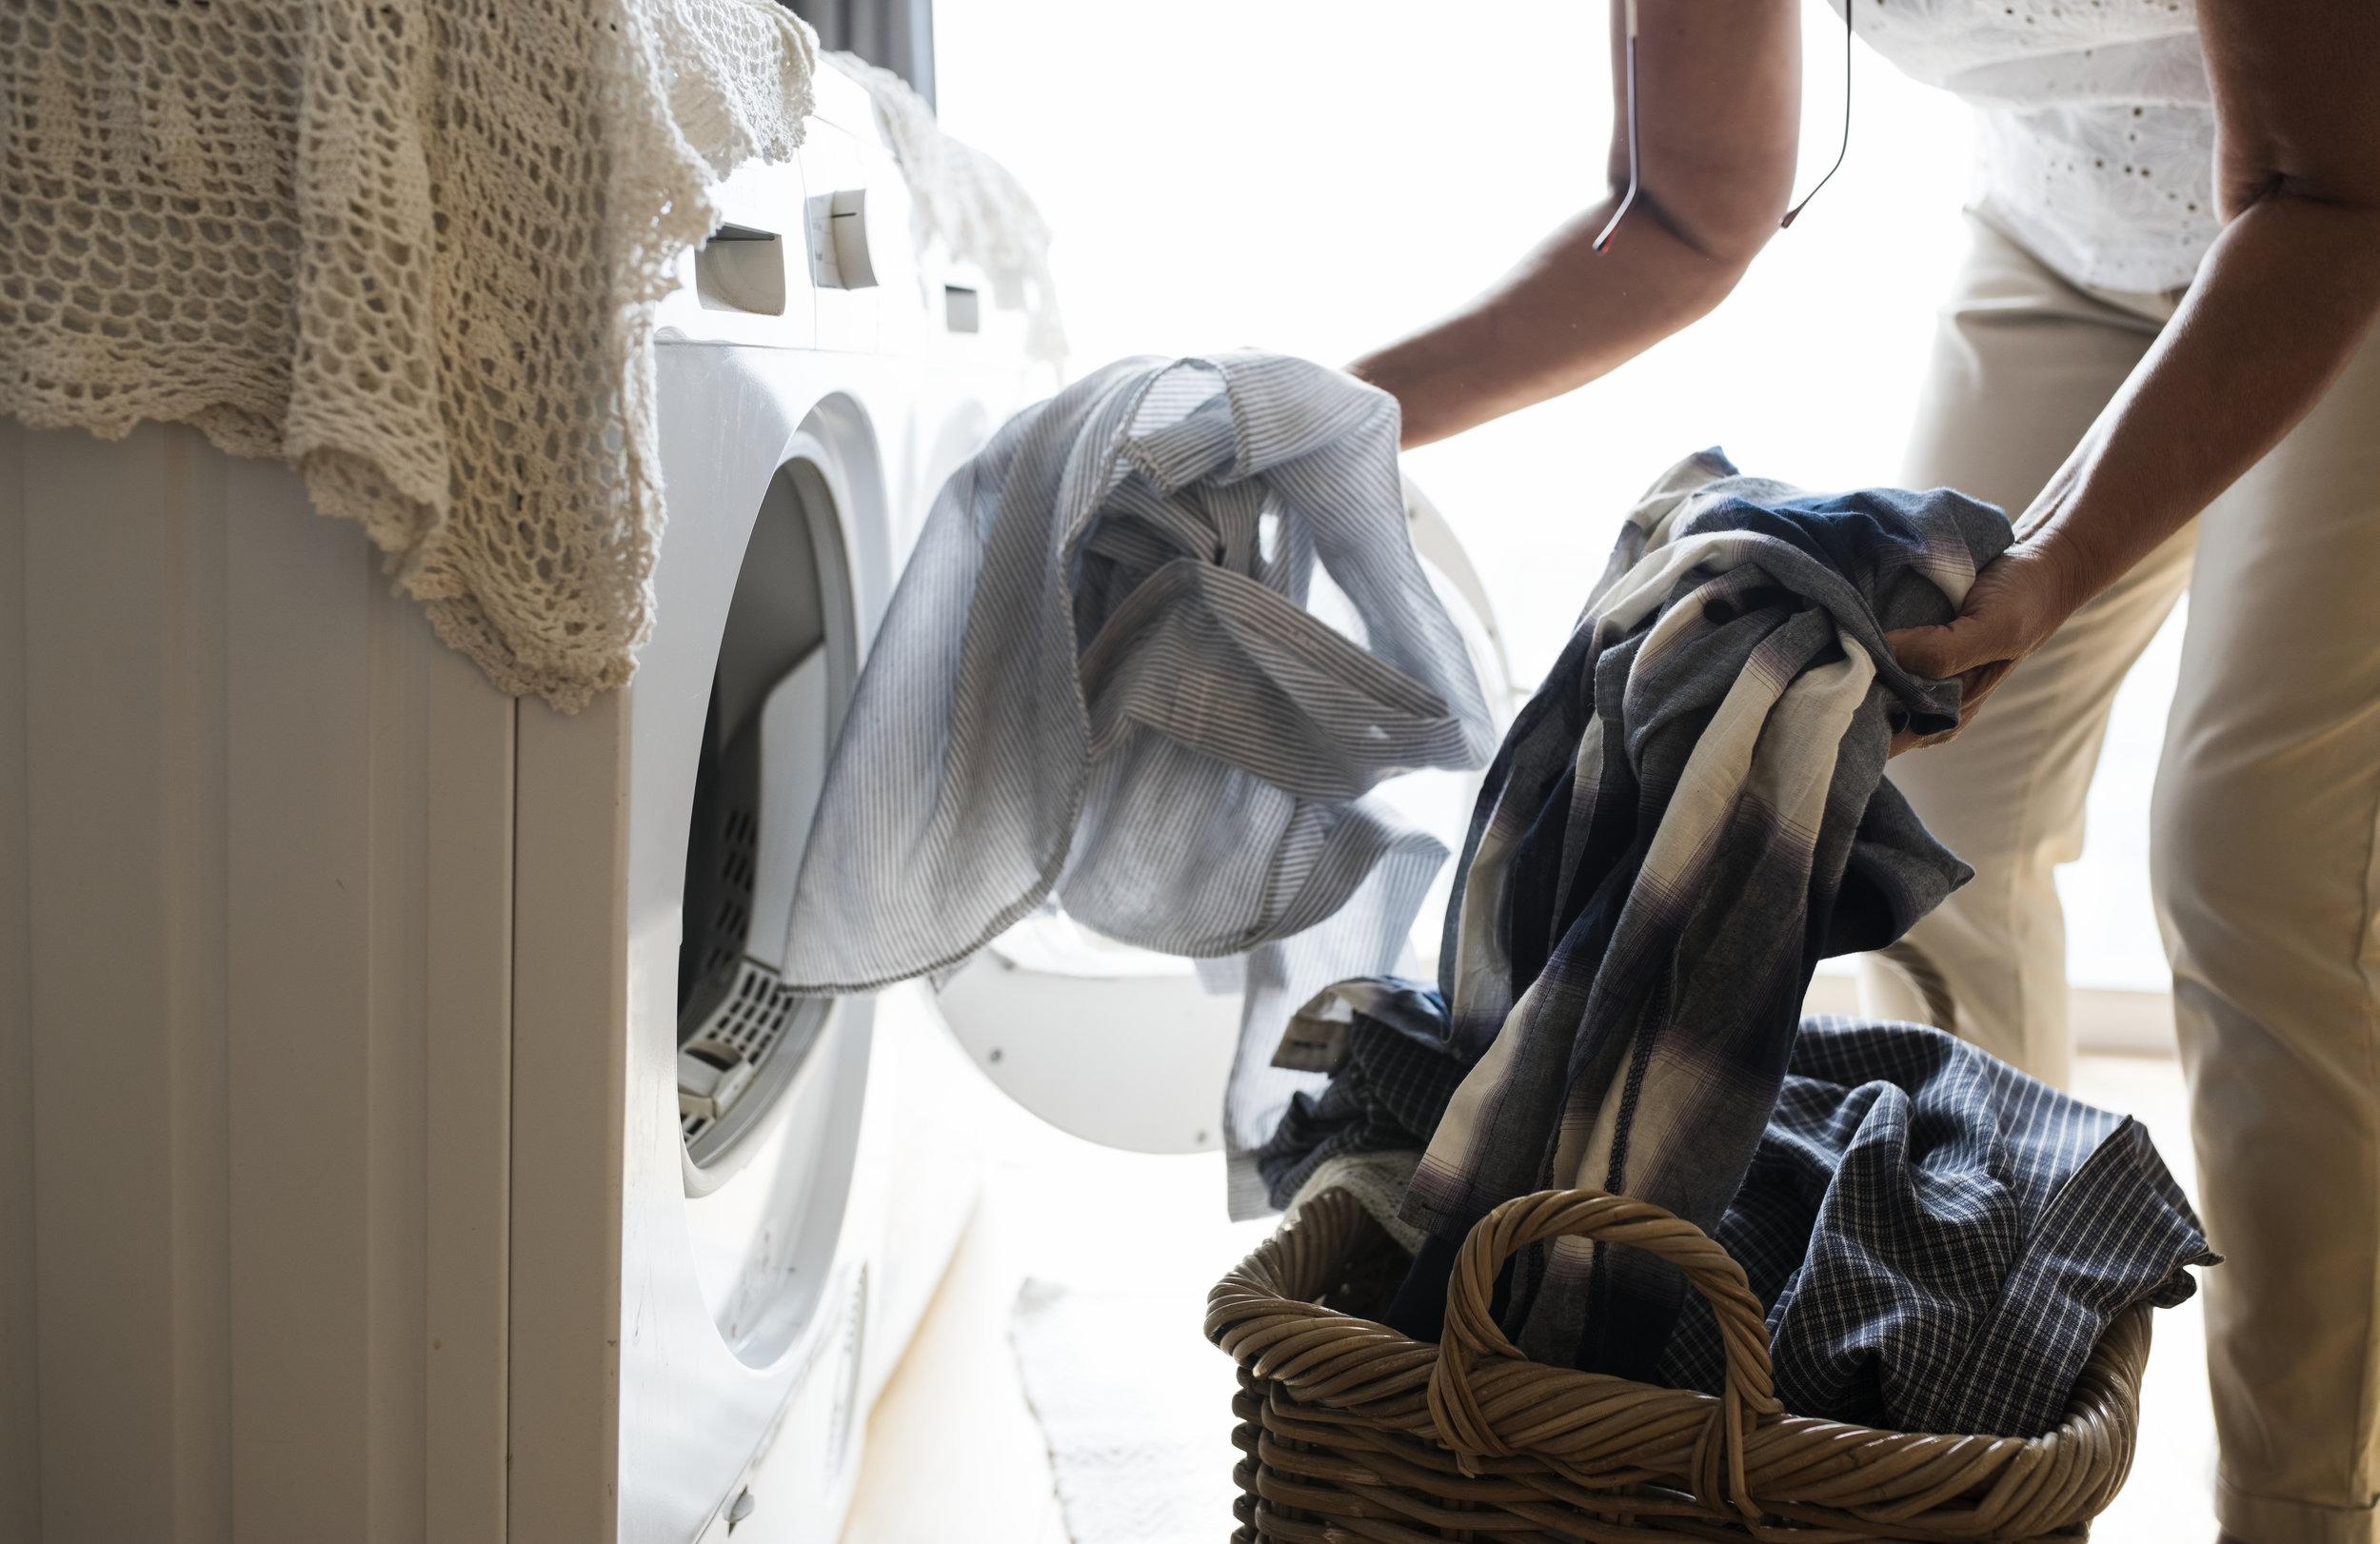 photodune-21767699-elderly-woman-doing-a-laundry-xxl.jpg